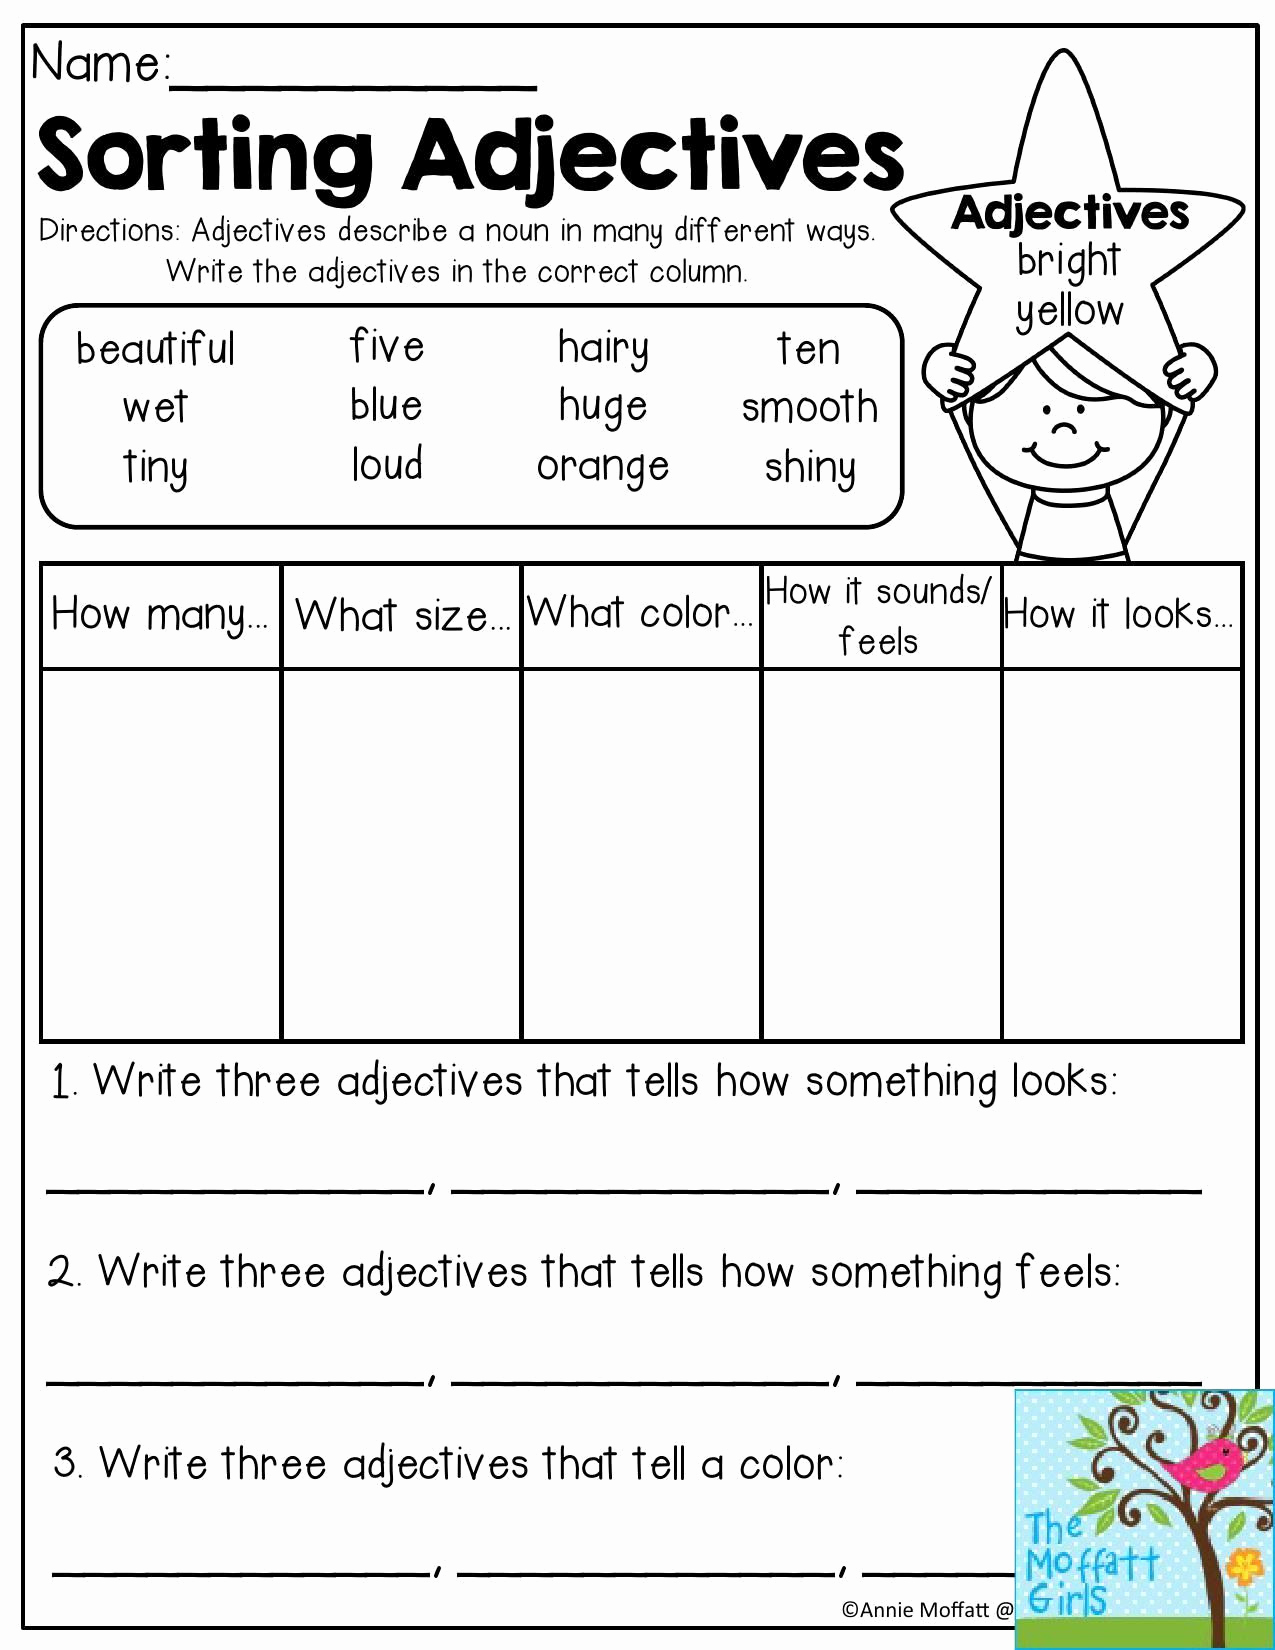 Free Printable Adjective Worksheets Beautiful 20 Adjective Worksheets 1st Grade